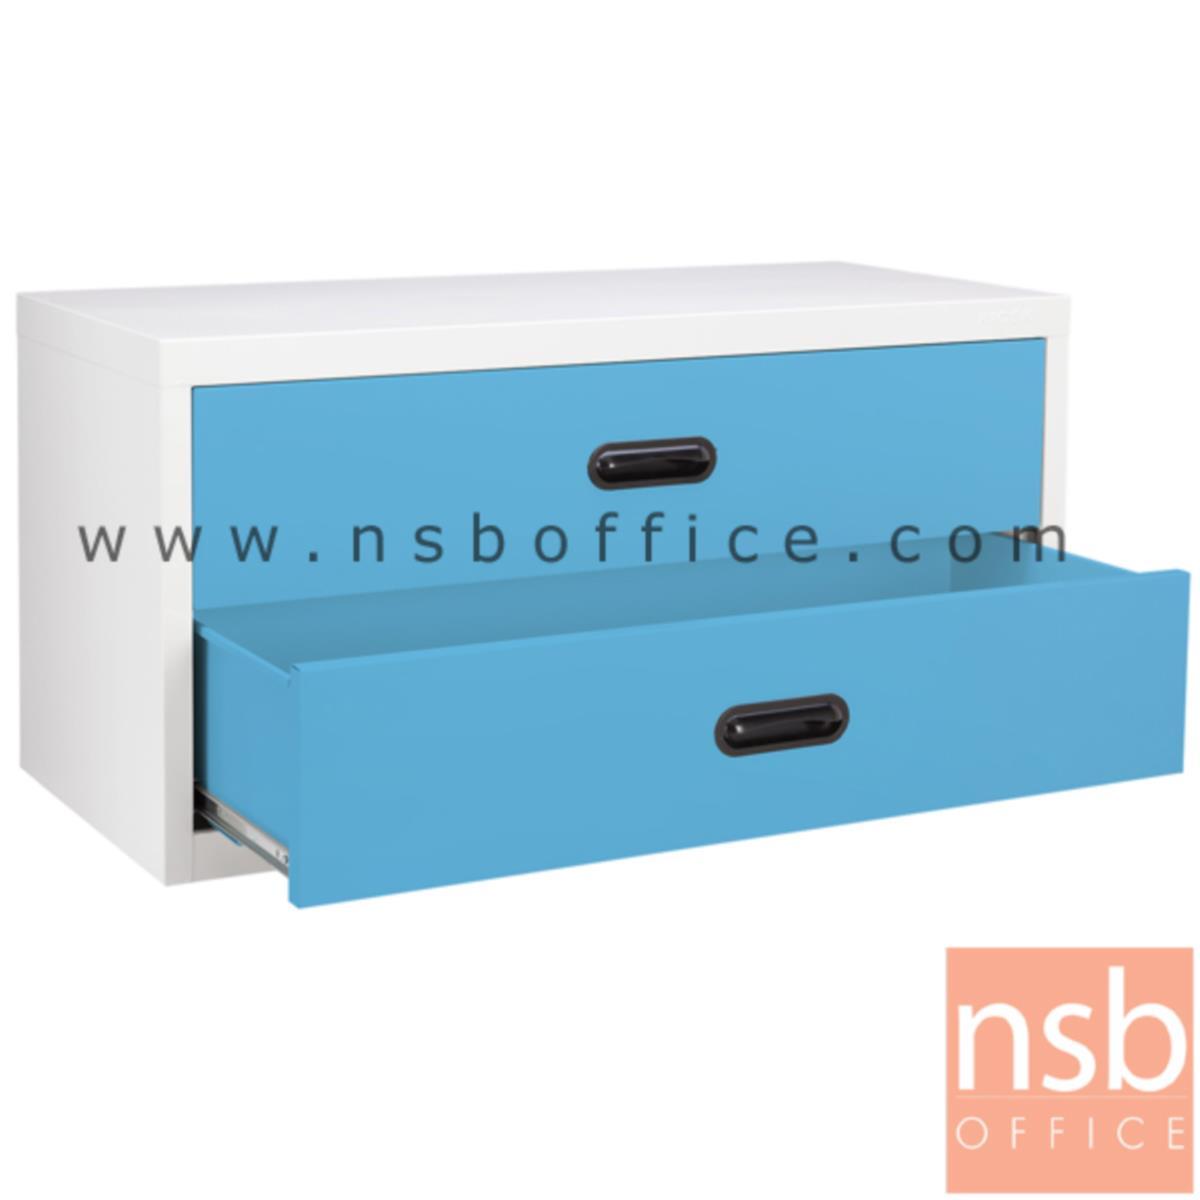 E25A008:ตู้เหล็ก 2 ลิ้นชักเตี้ย 3 ฟุต 88W*40.7D*44H cm รุ่น USB-4